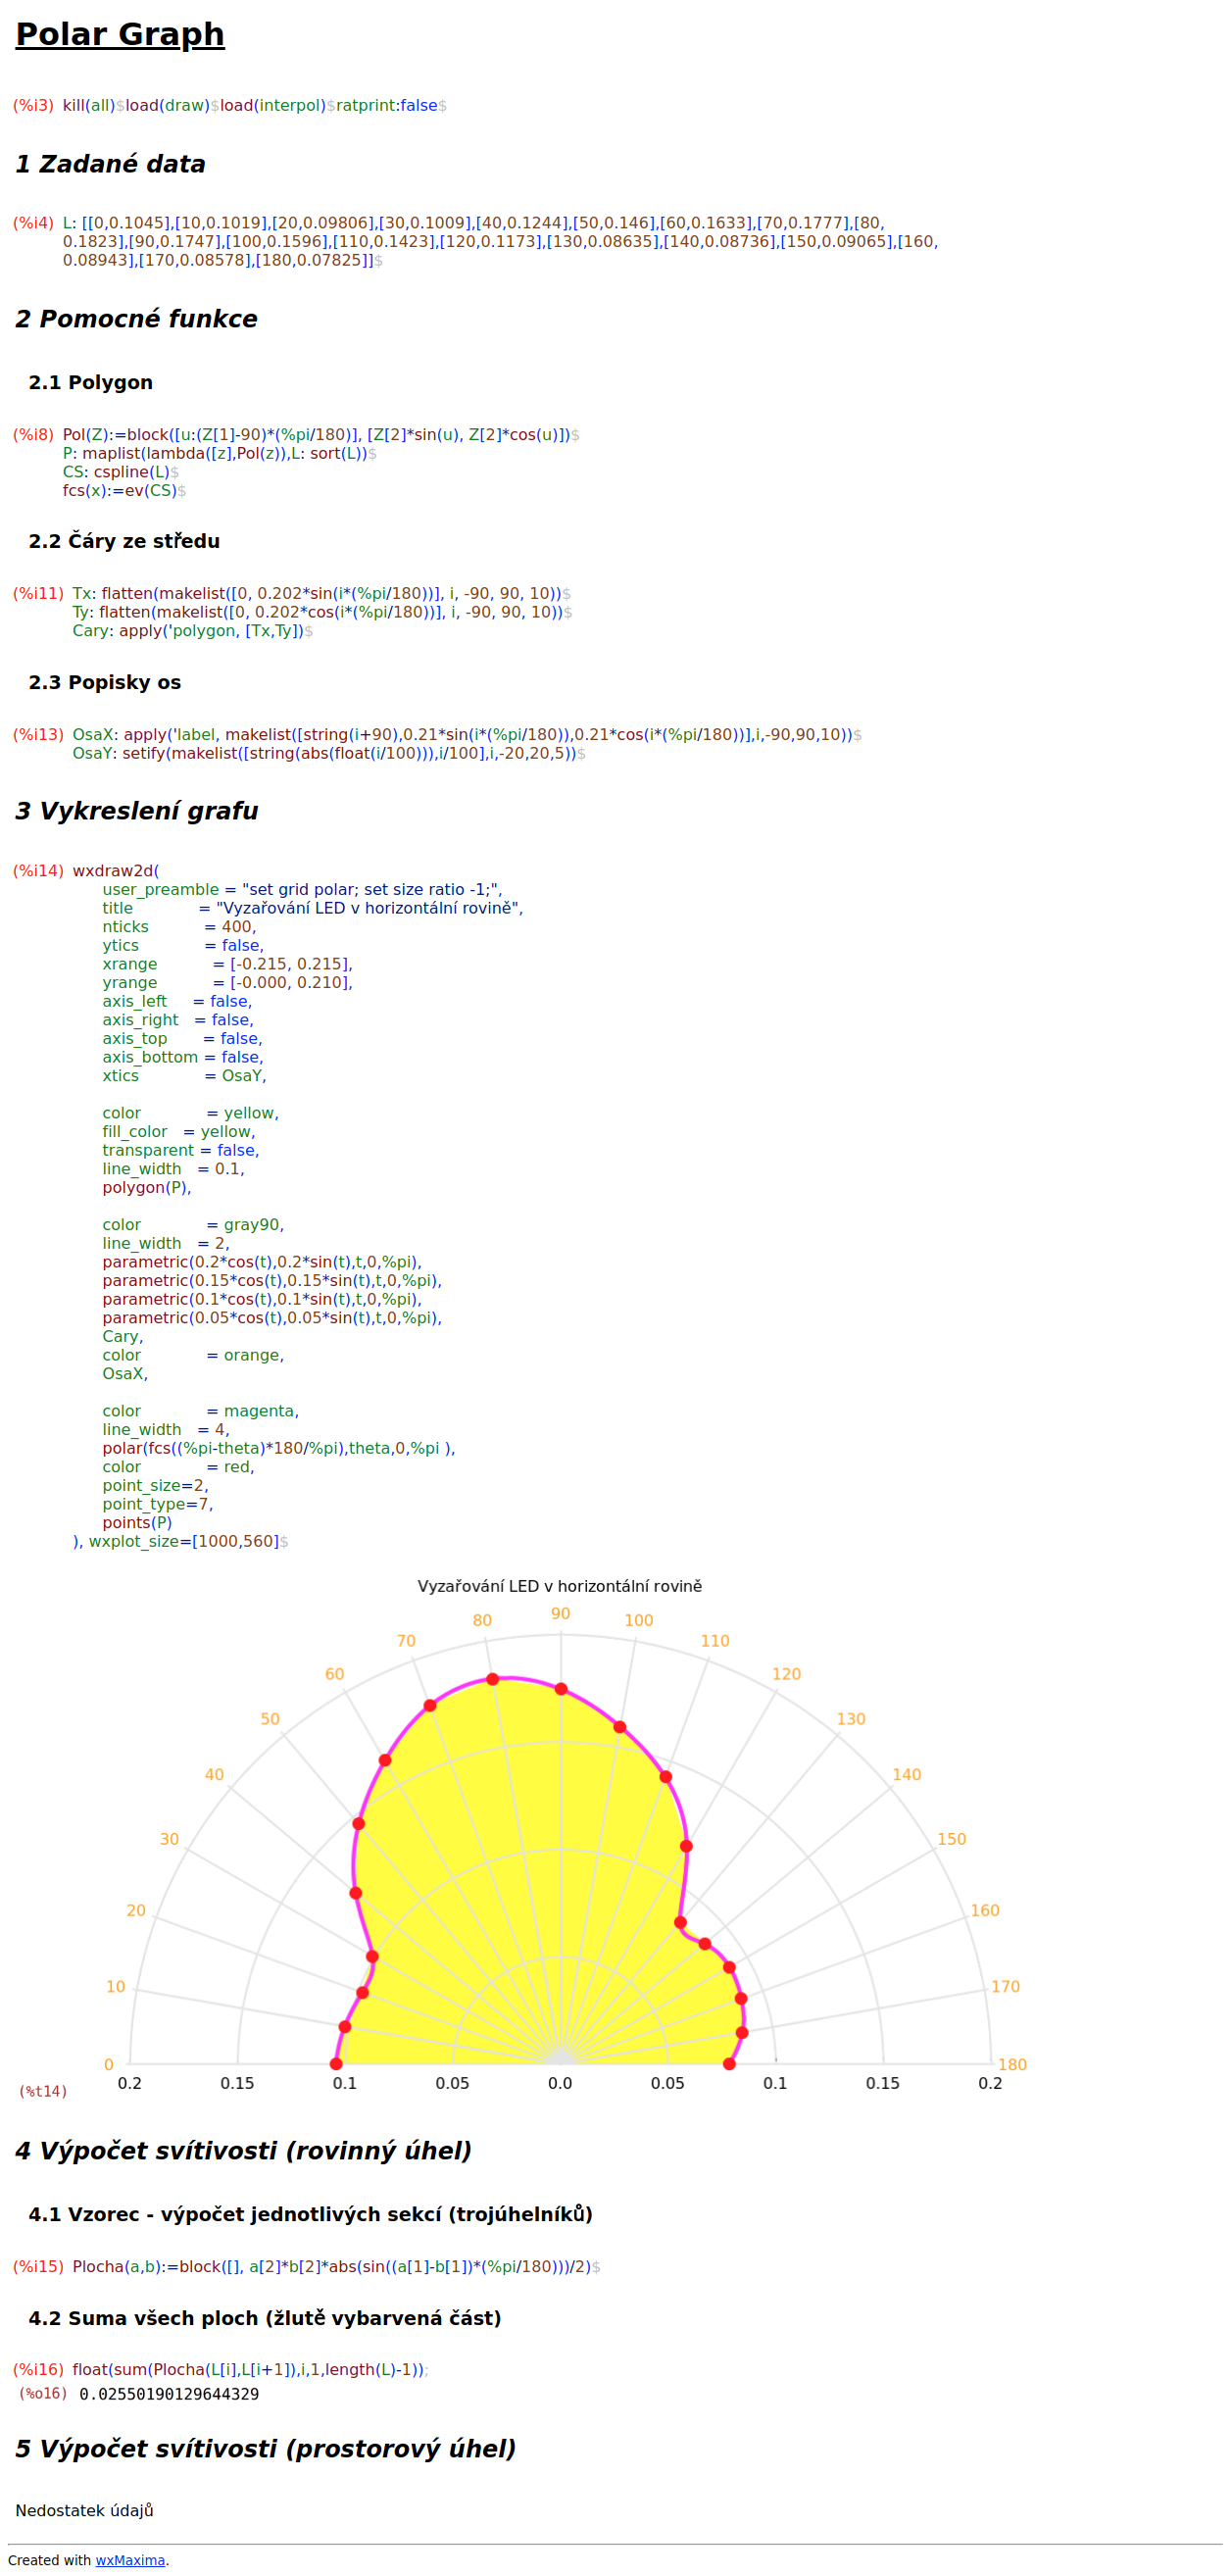 http://forum.matematika.cz/upload3/img/2018-02/70865_Polar-Graph%2B-%2Bfile.png